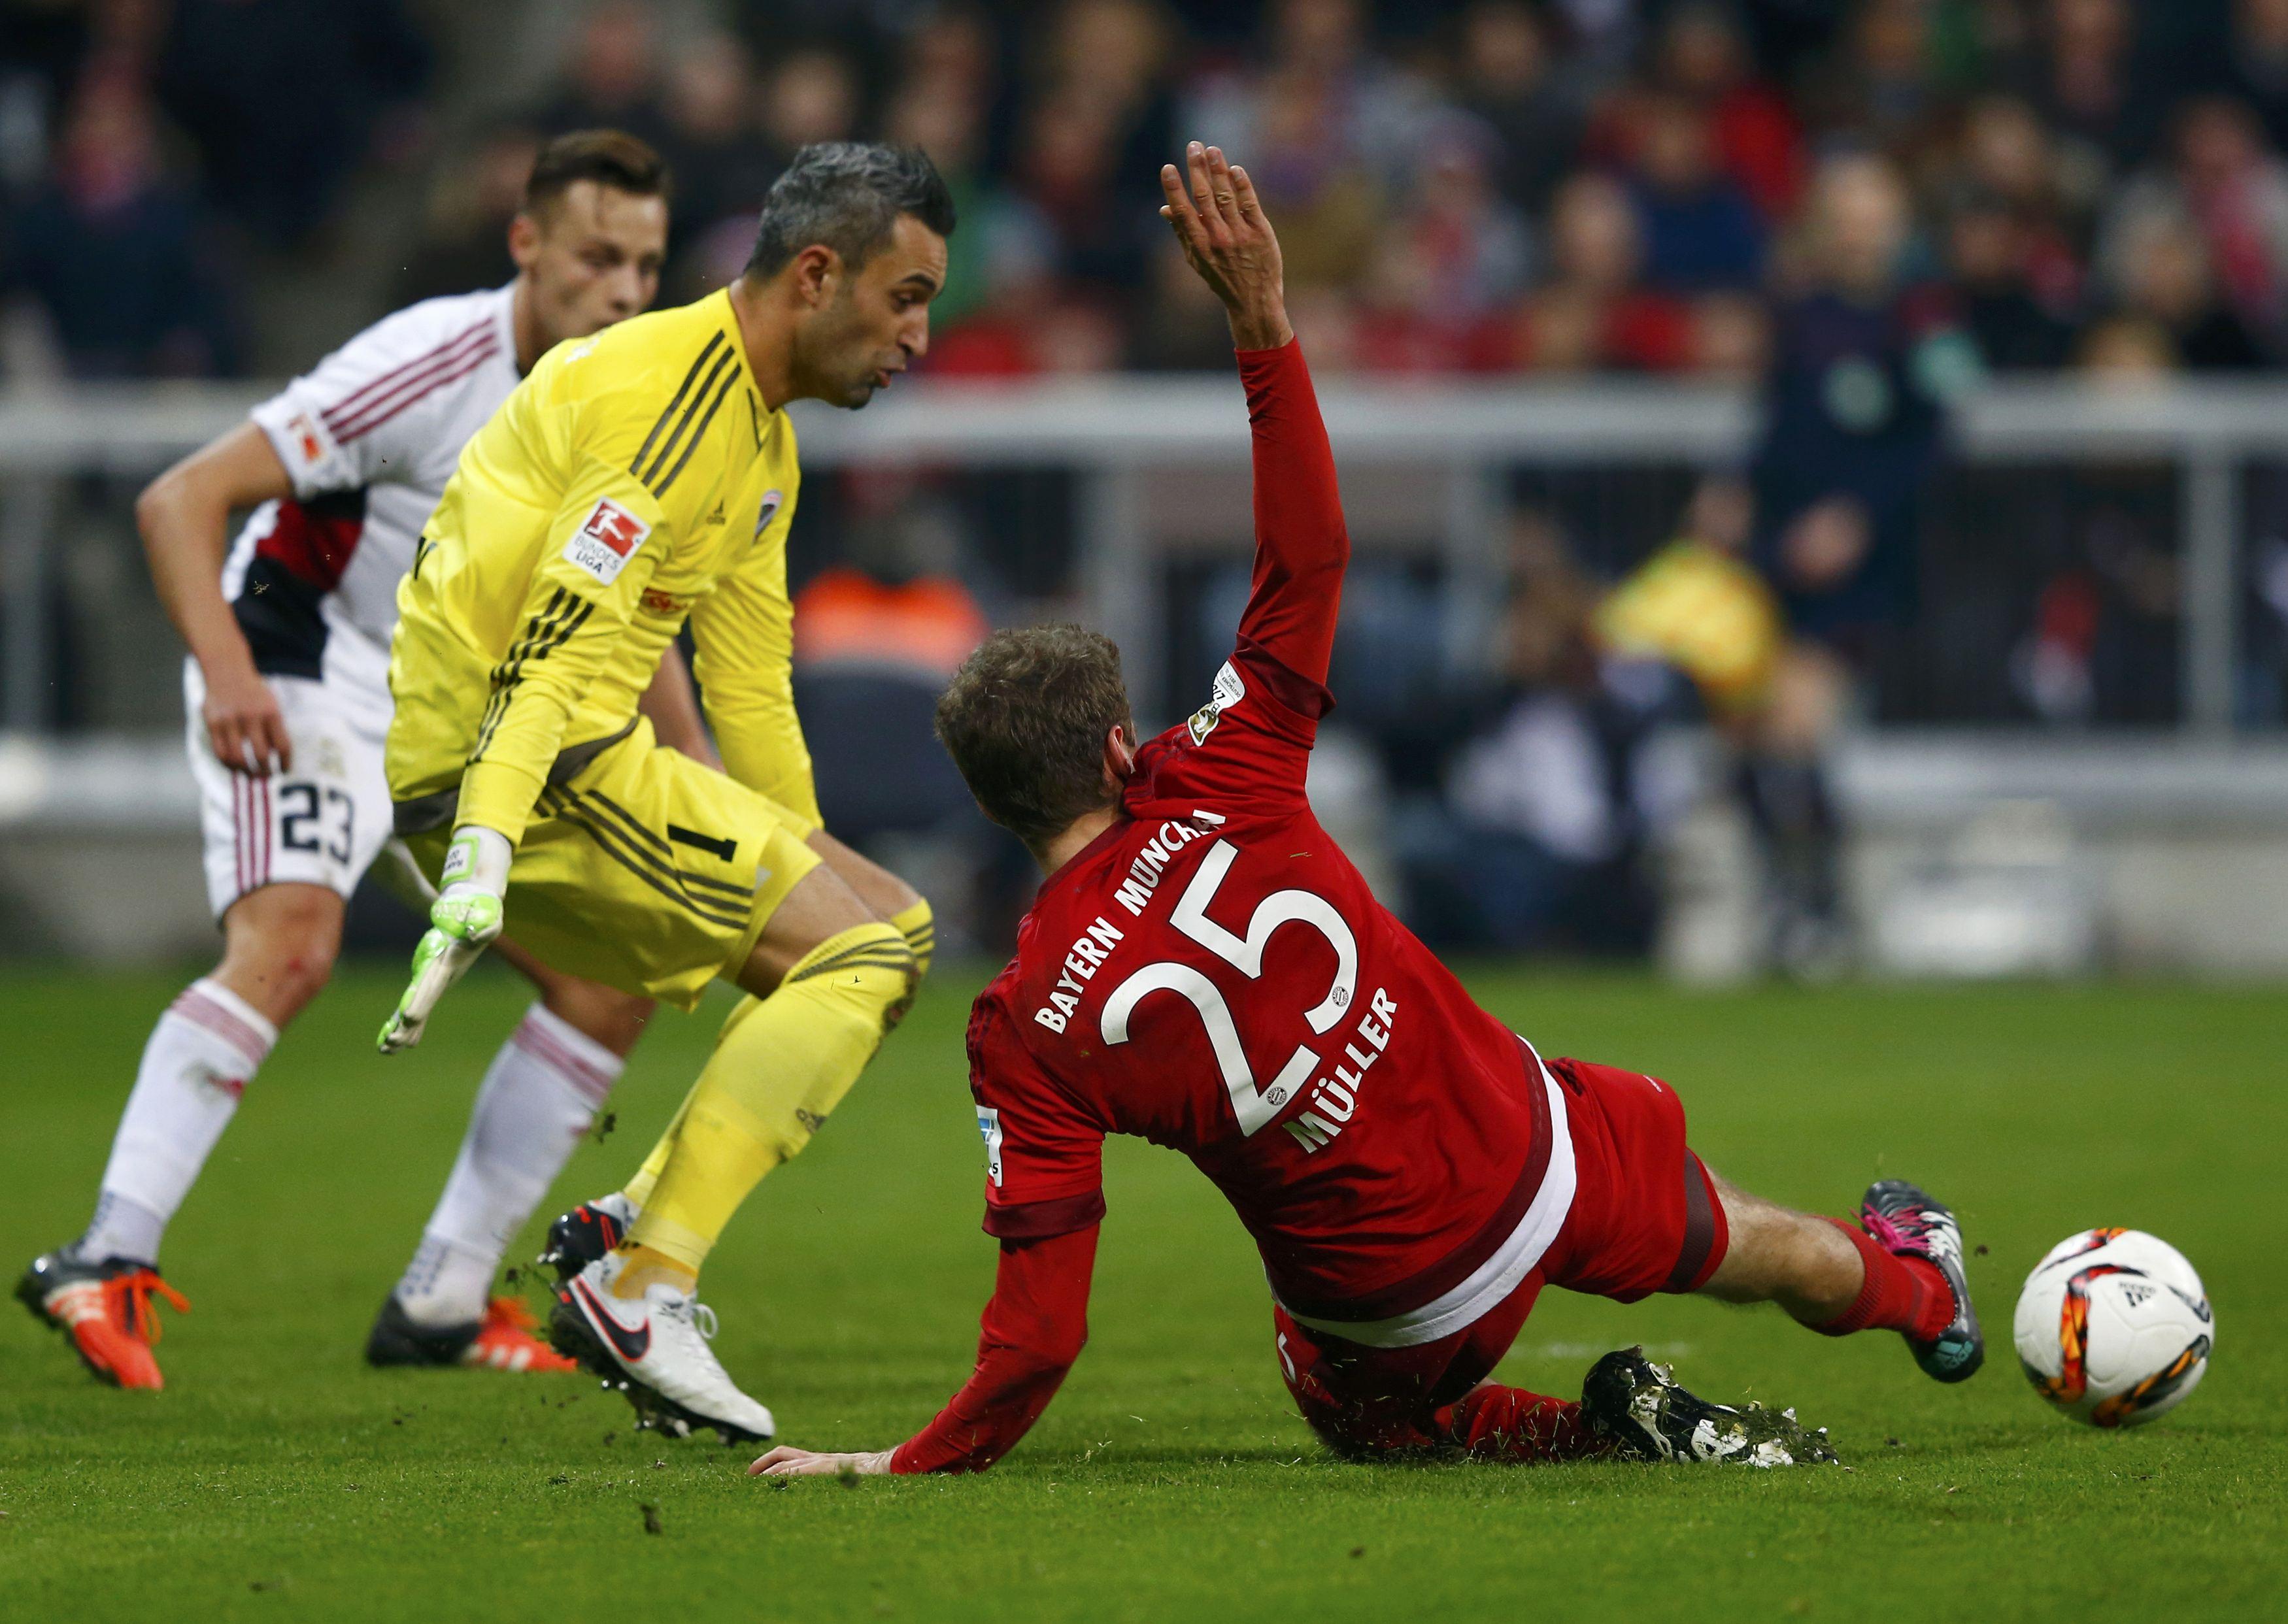 Bayern Munich's Thomas Mueller and FC Ingolstadt 04's goalkeeper Ramazan Ozcan in action, on December 12, 2015. Photo: Reuters